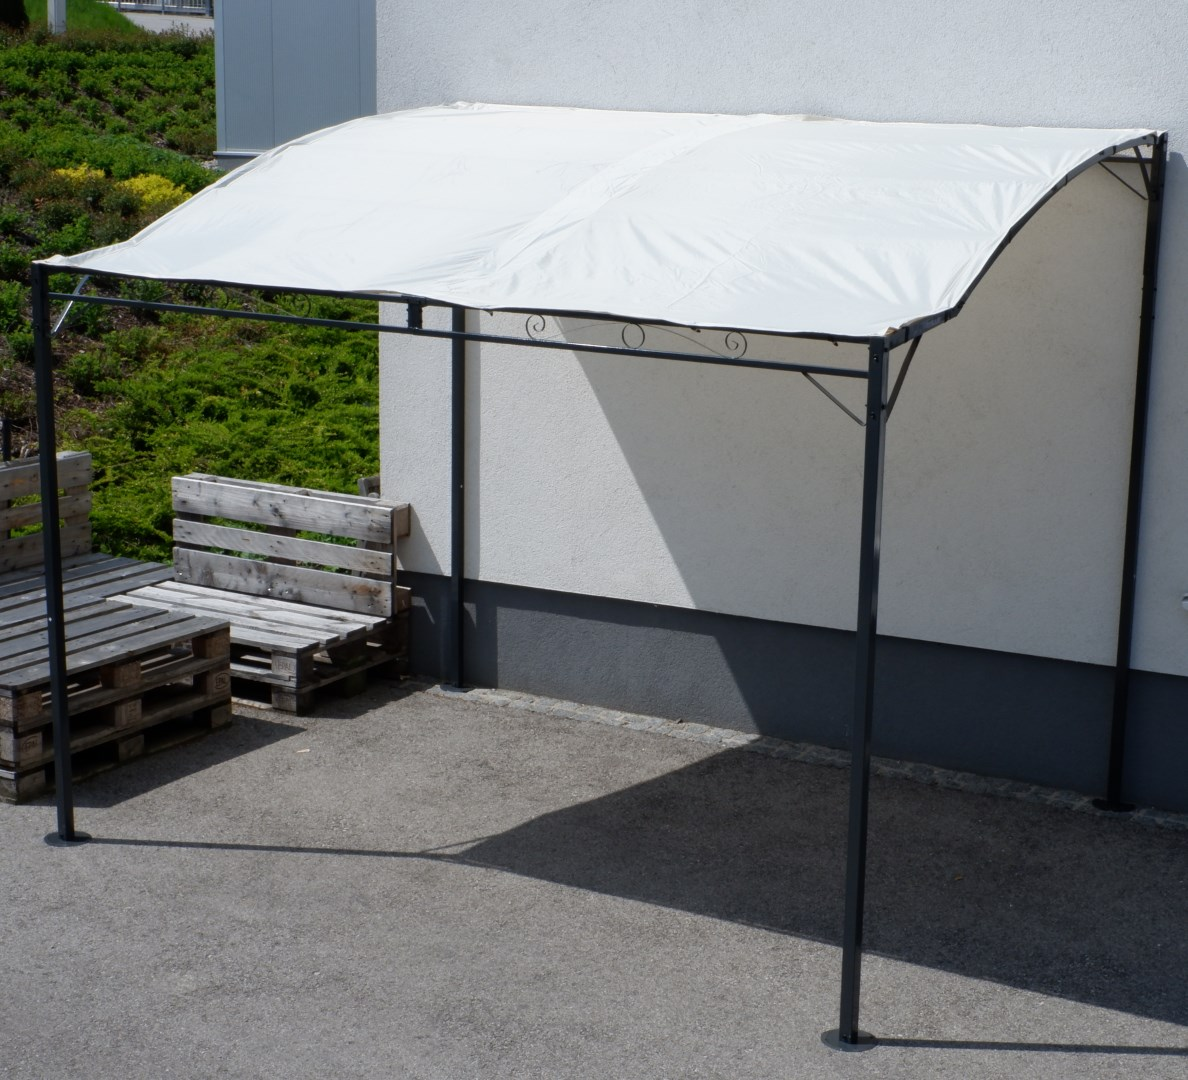 wand anbau pavillon 3 x 2 5 meter mit dach 100 wasserdicht uv30 model tropea kaufen bei as